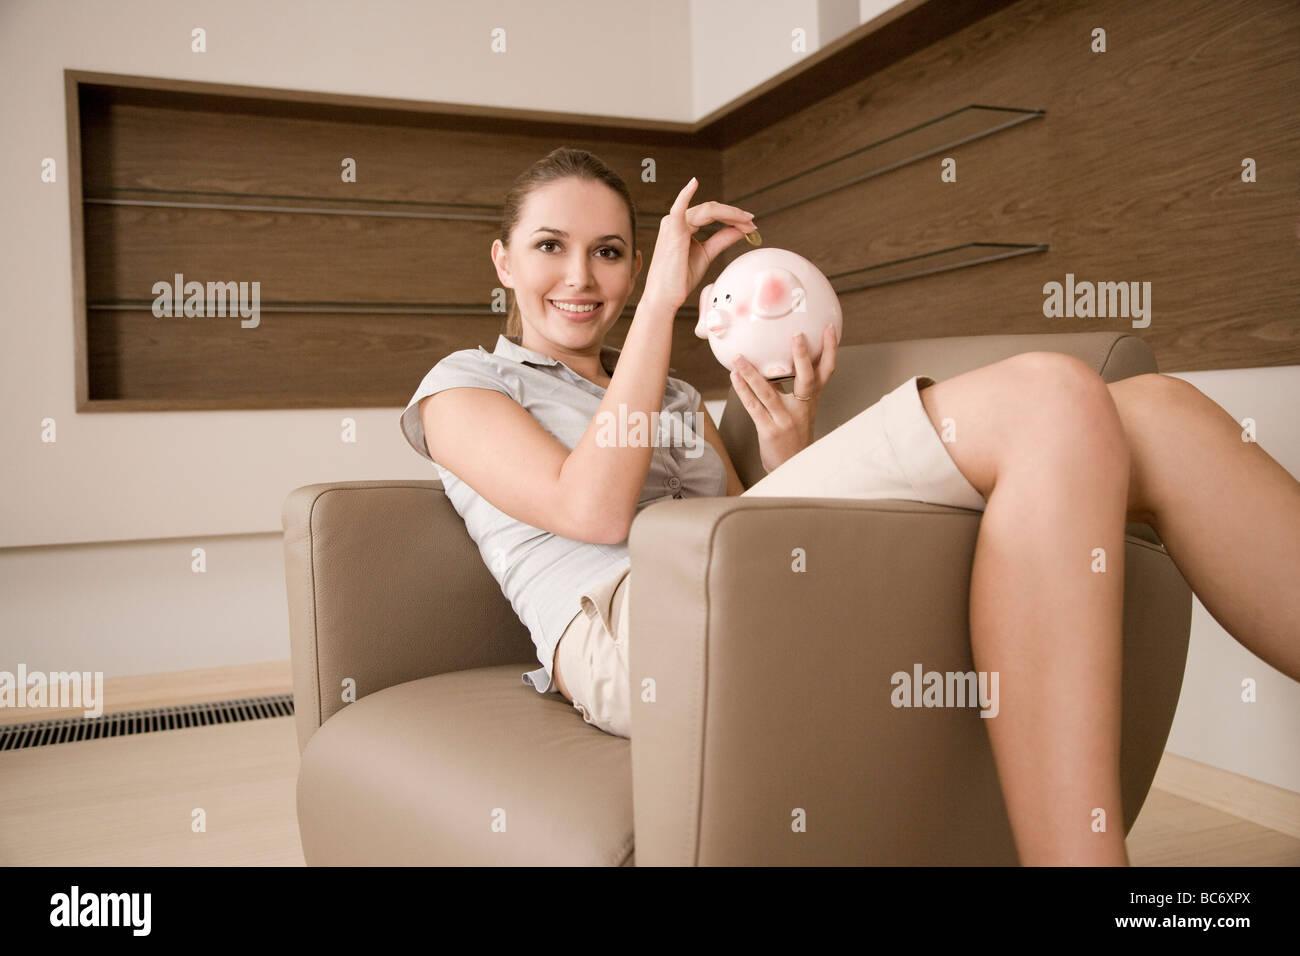 woman saving money - Stock Image